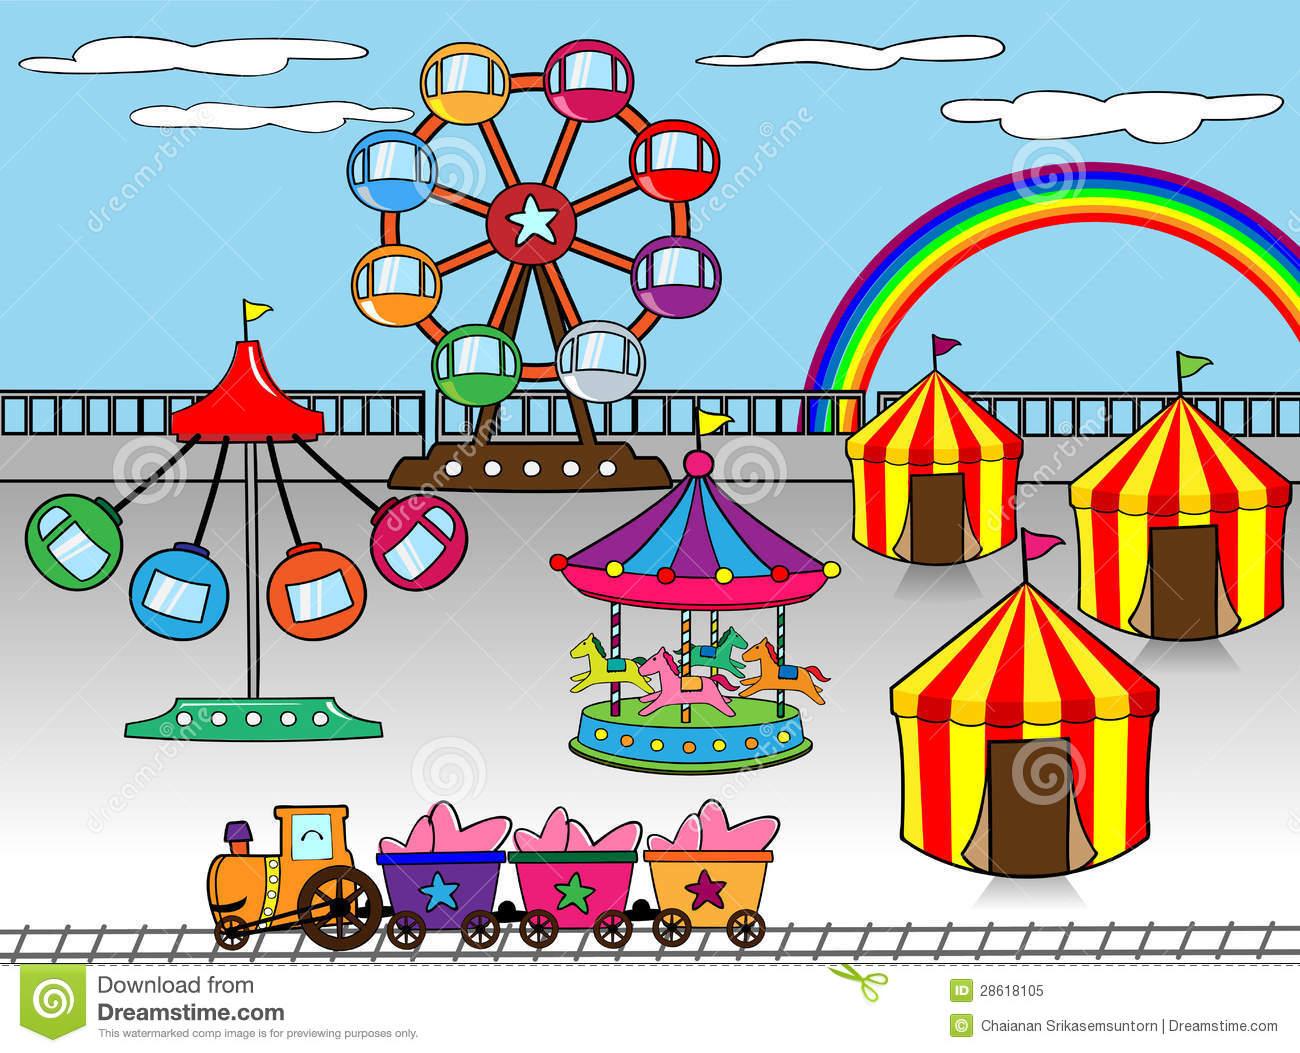 1300x1053 Drawing Of Amusement Park Amusement Park Royalty Free Stock Photo